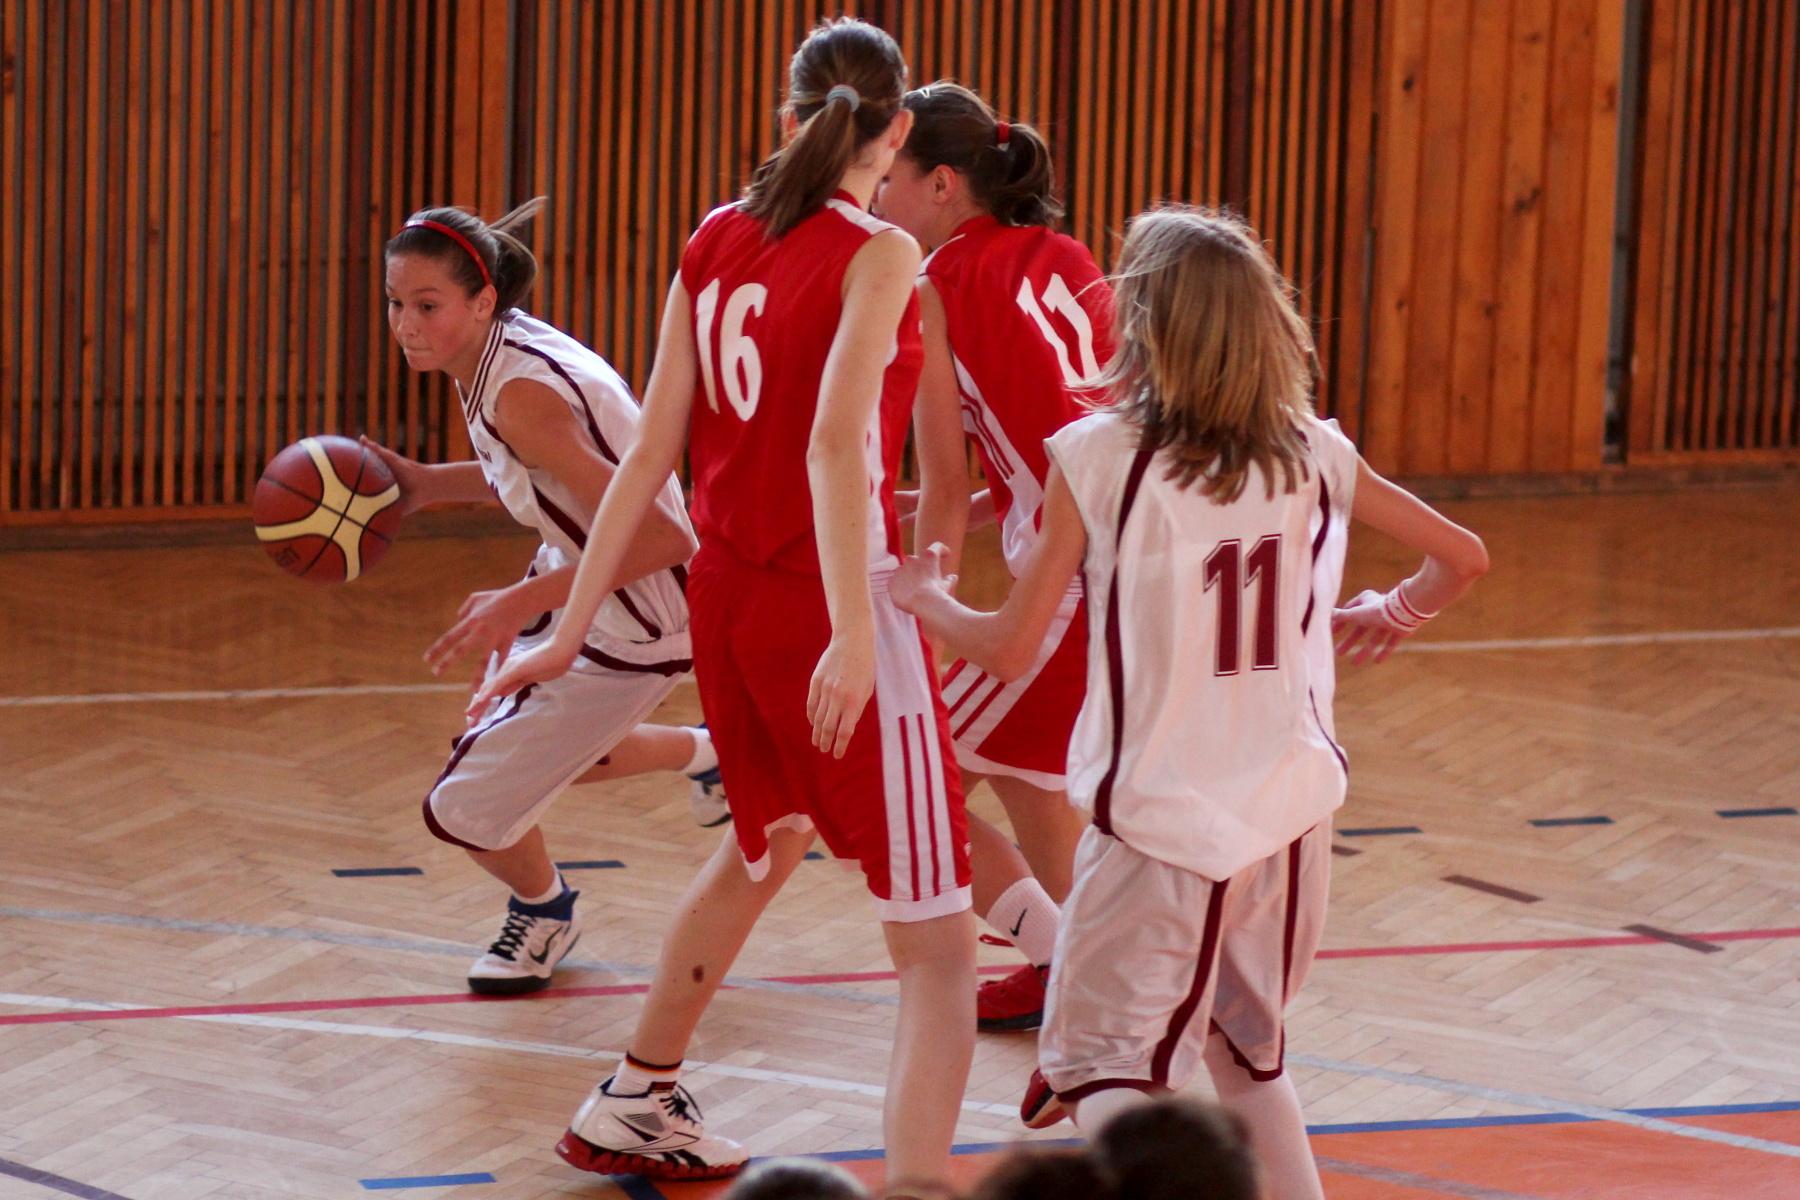 zvolen-bystrica-ziacky-basketbal-21